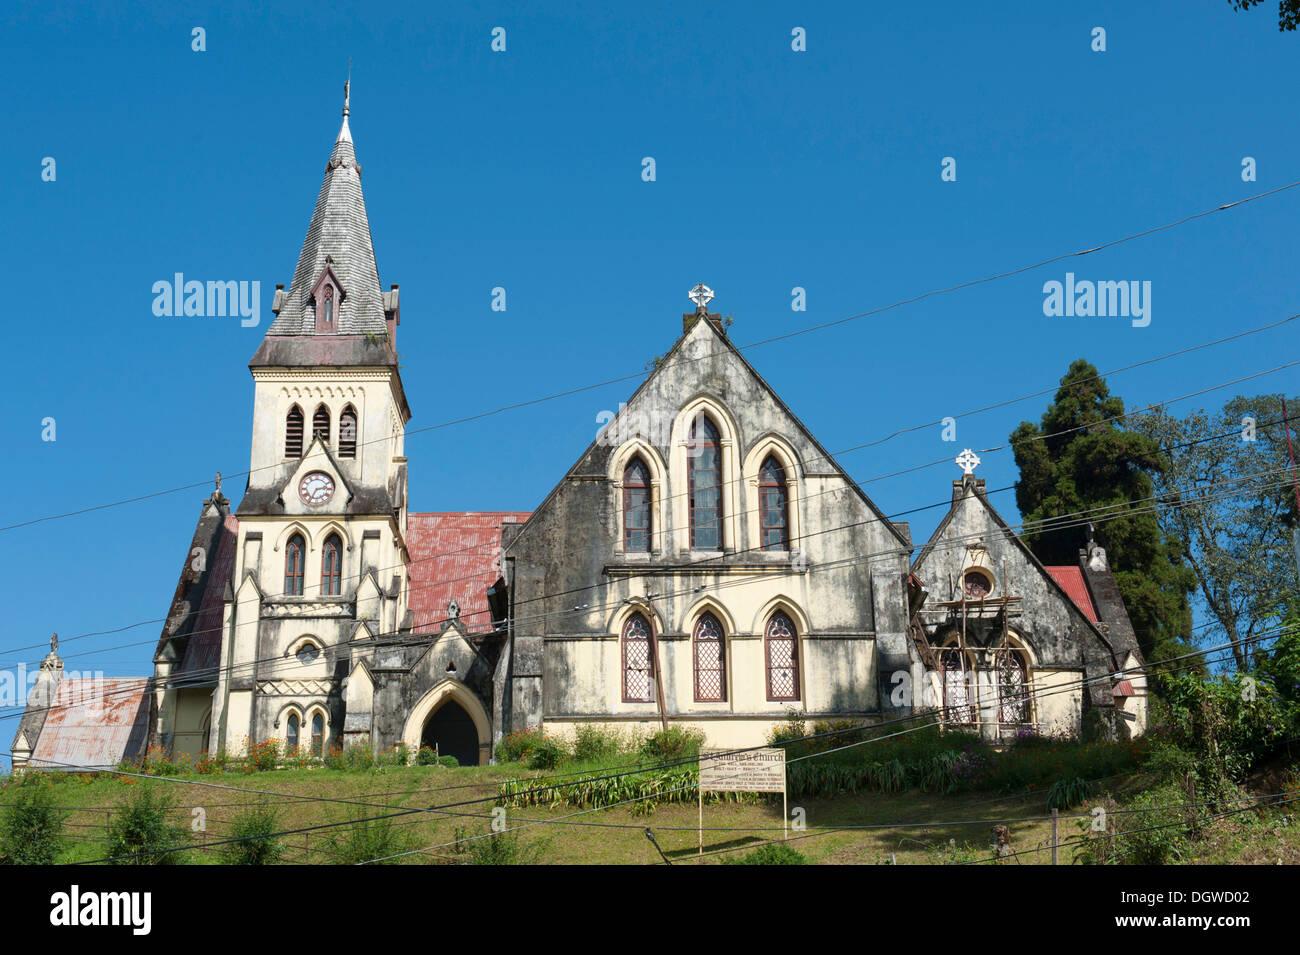 St. Andrew's Church, British colonial era, Darjeeling, West Bengal, Lower Himalayan Range, India, South Asia, - Stock Image